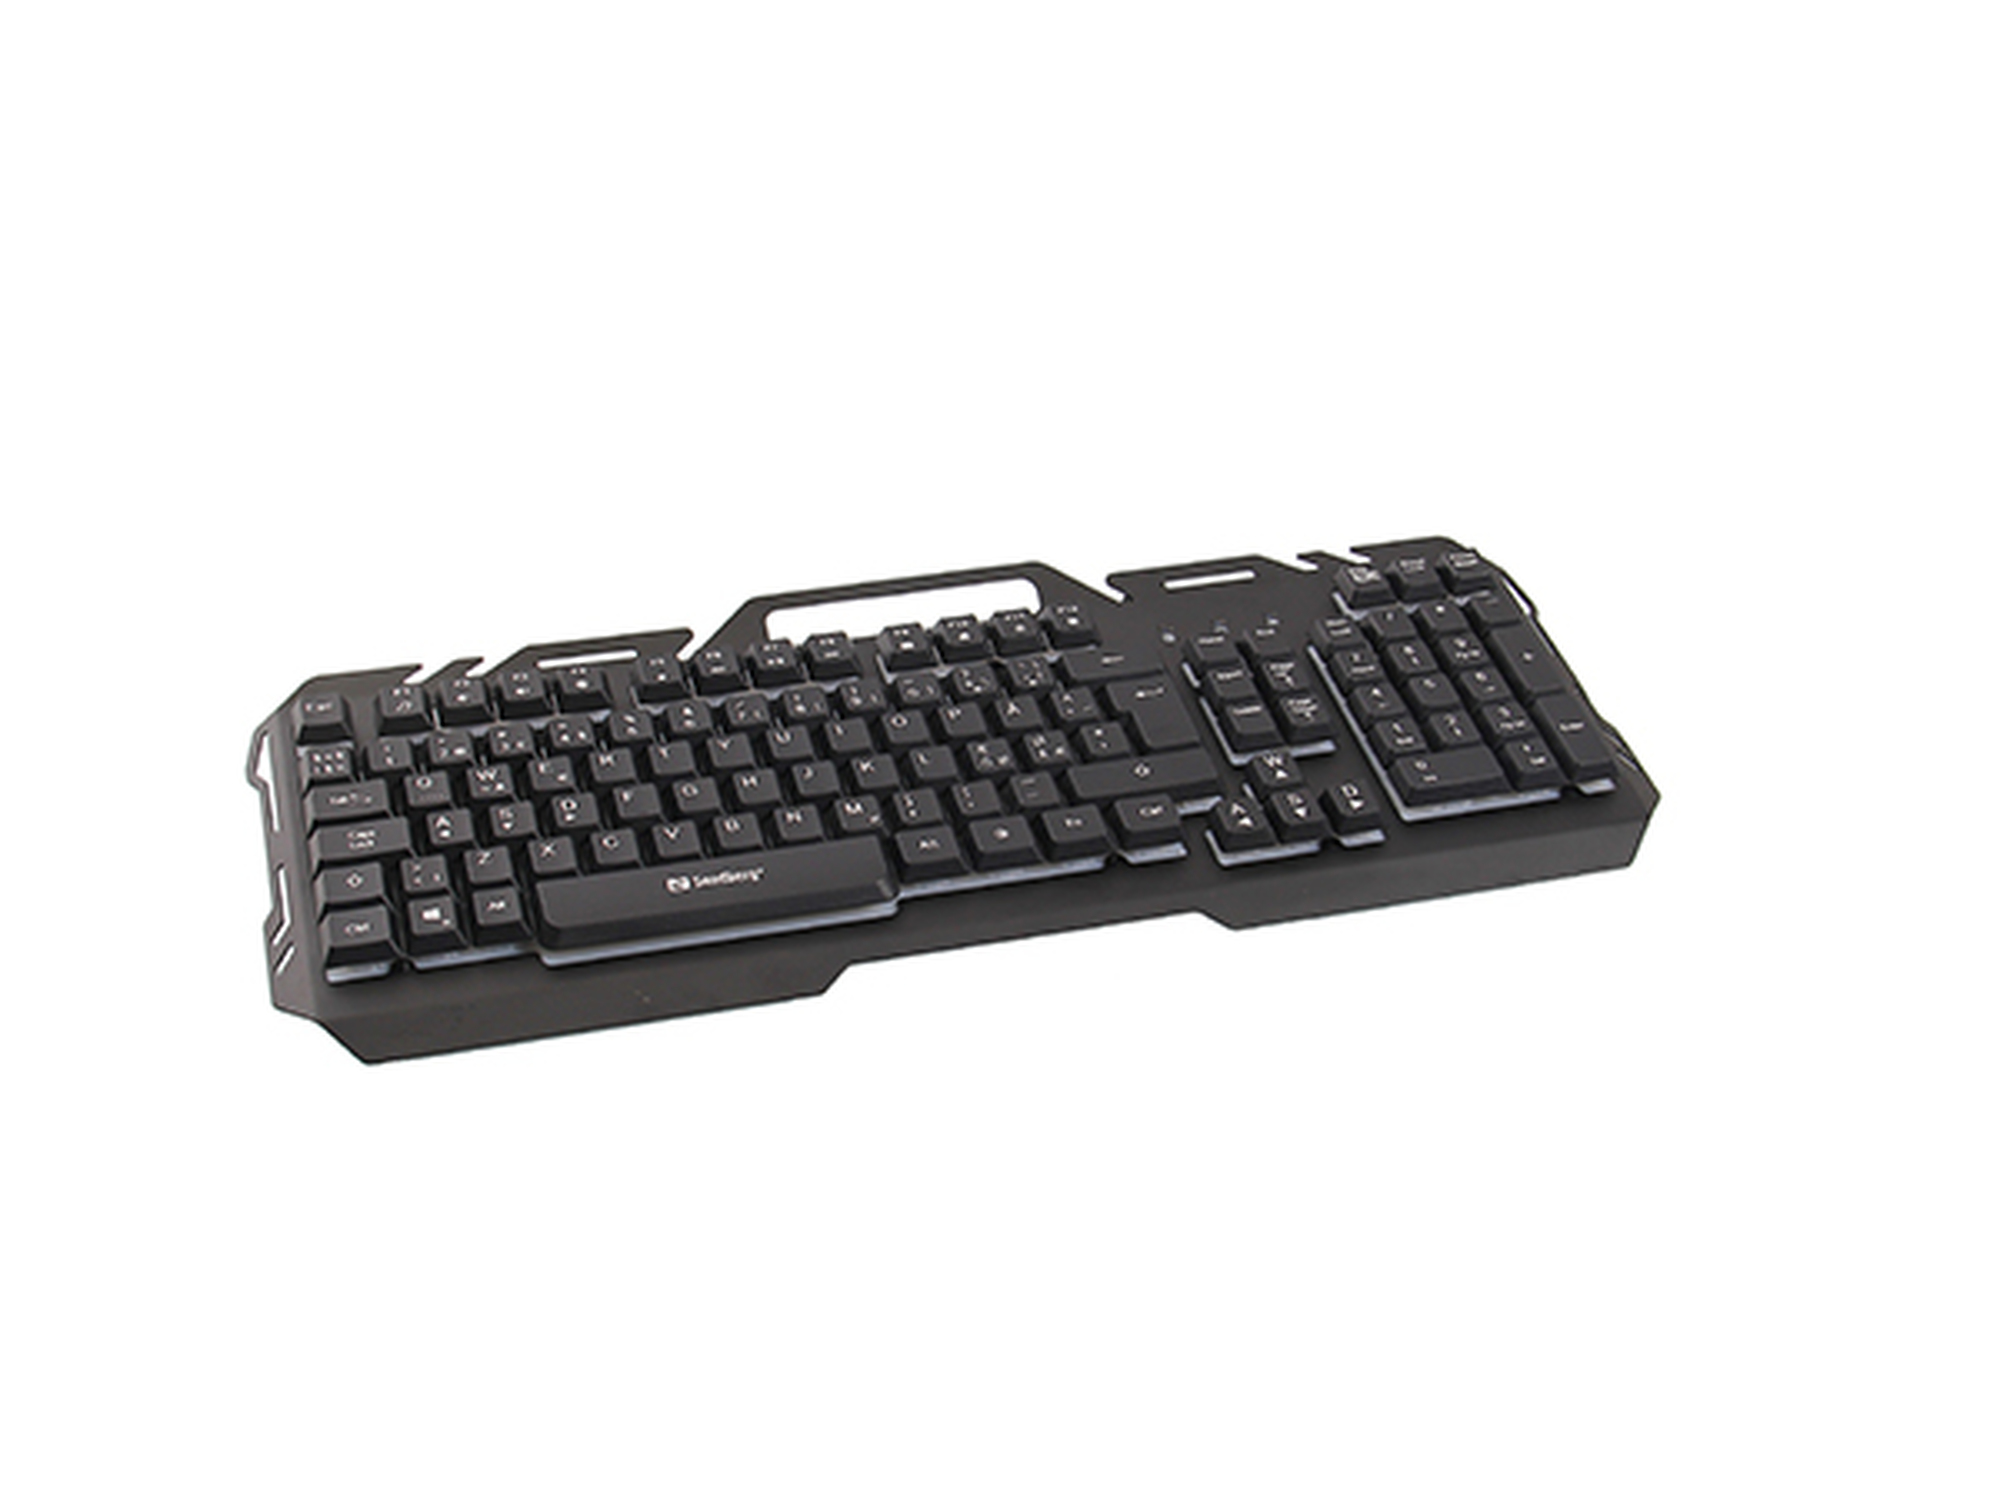 Sandberg 640-15 toetsenborden